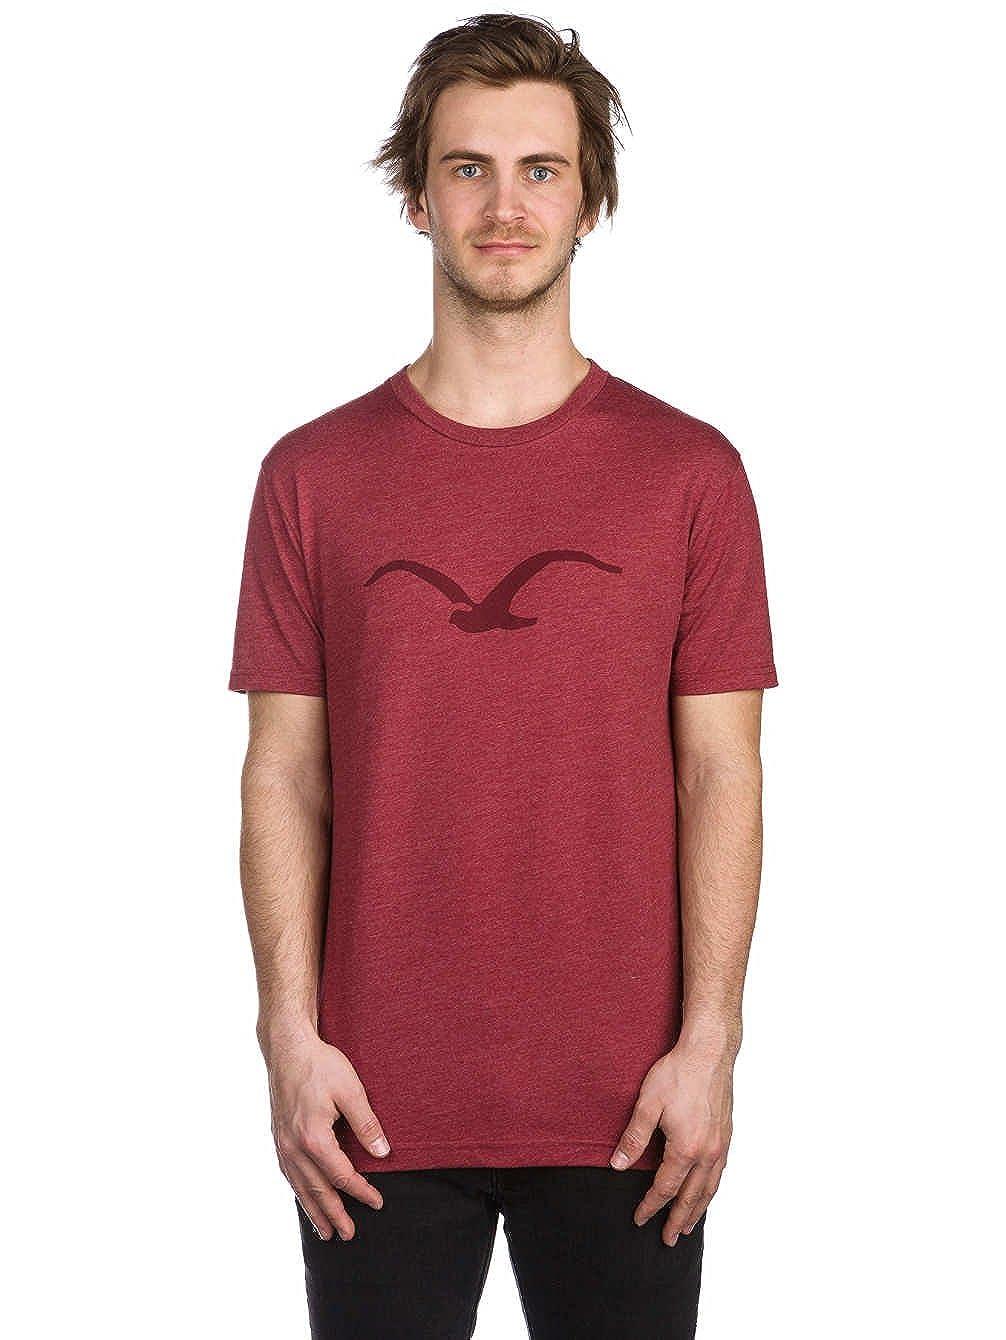 Cleptomanicx Herren Herren Herren T-Shirt B078WV7VMJ T-Shirts Neuer Markt 9726b4